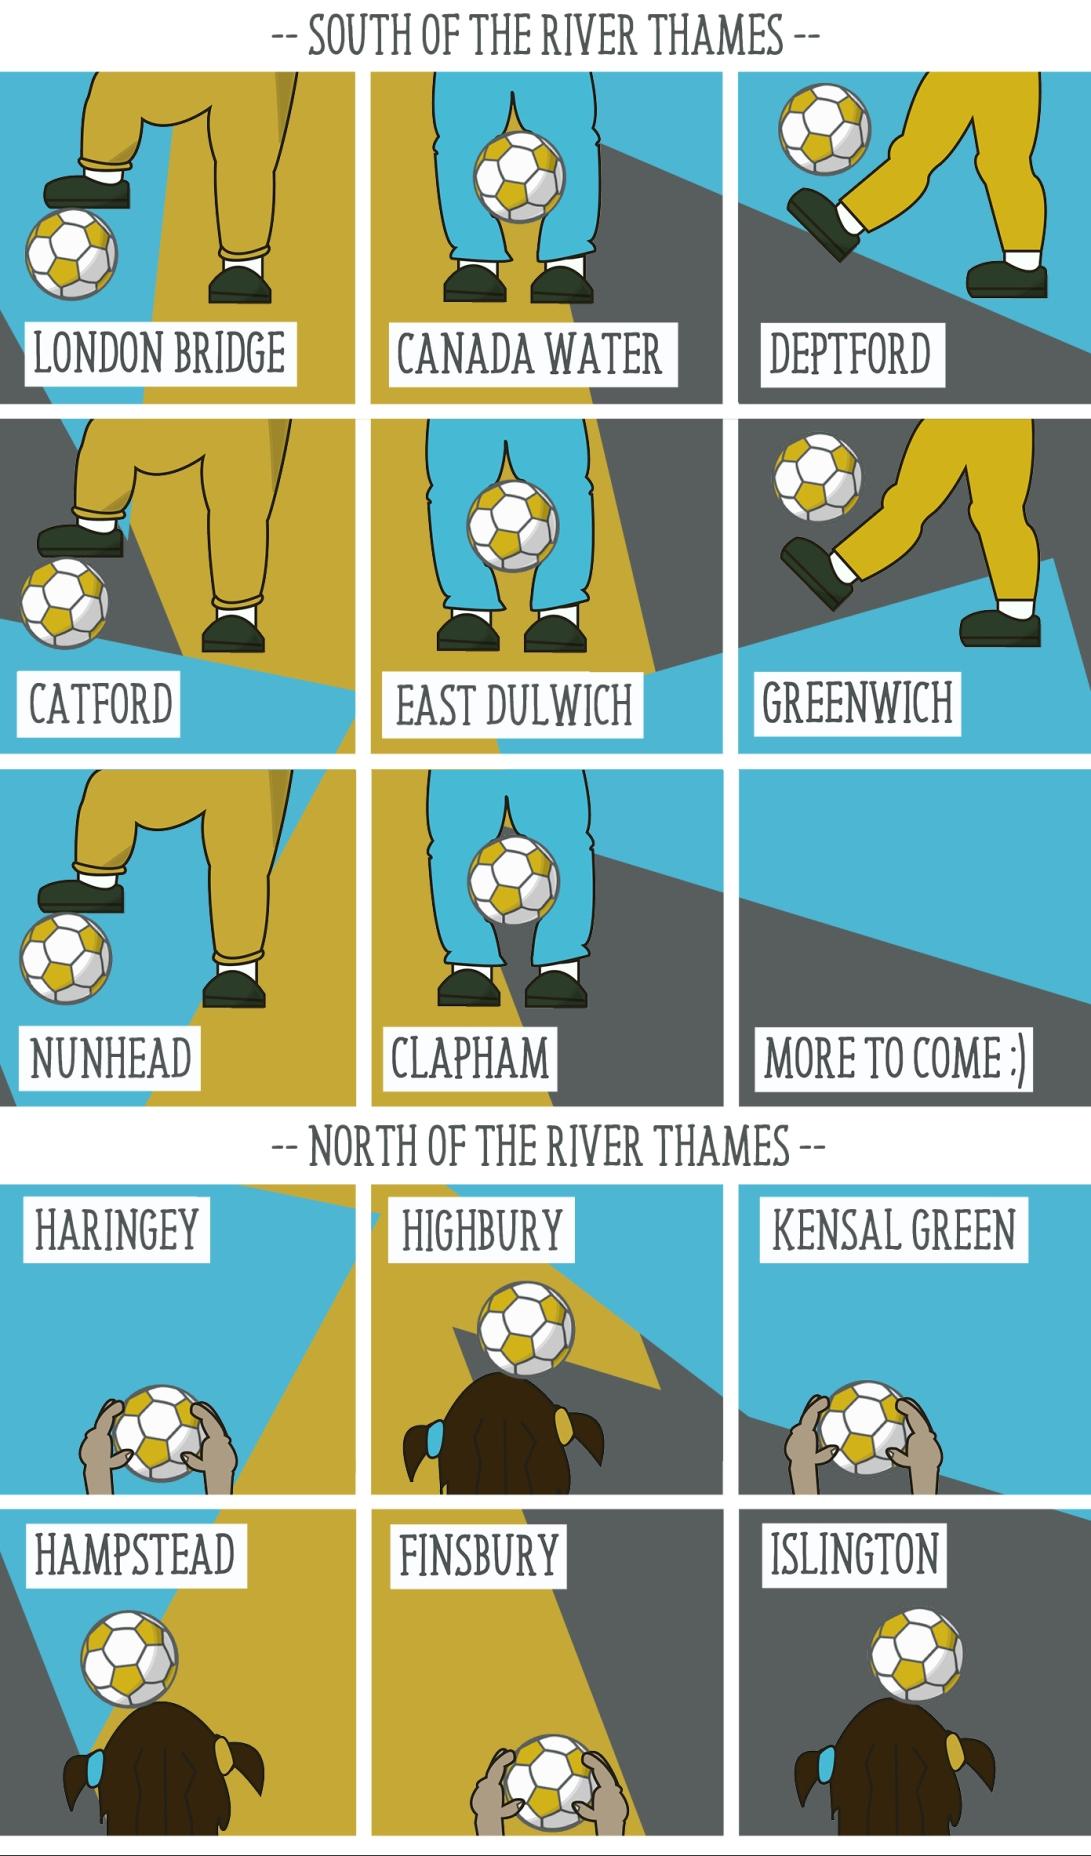 toddler-football-classes-coaching-north-London-N-SE-E-Southwark-Islington-Finchley-Lewisham-activities